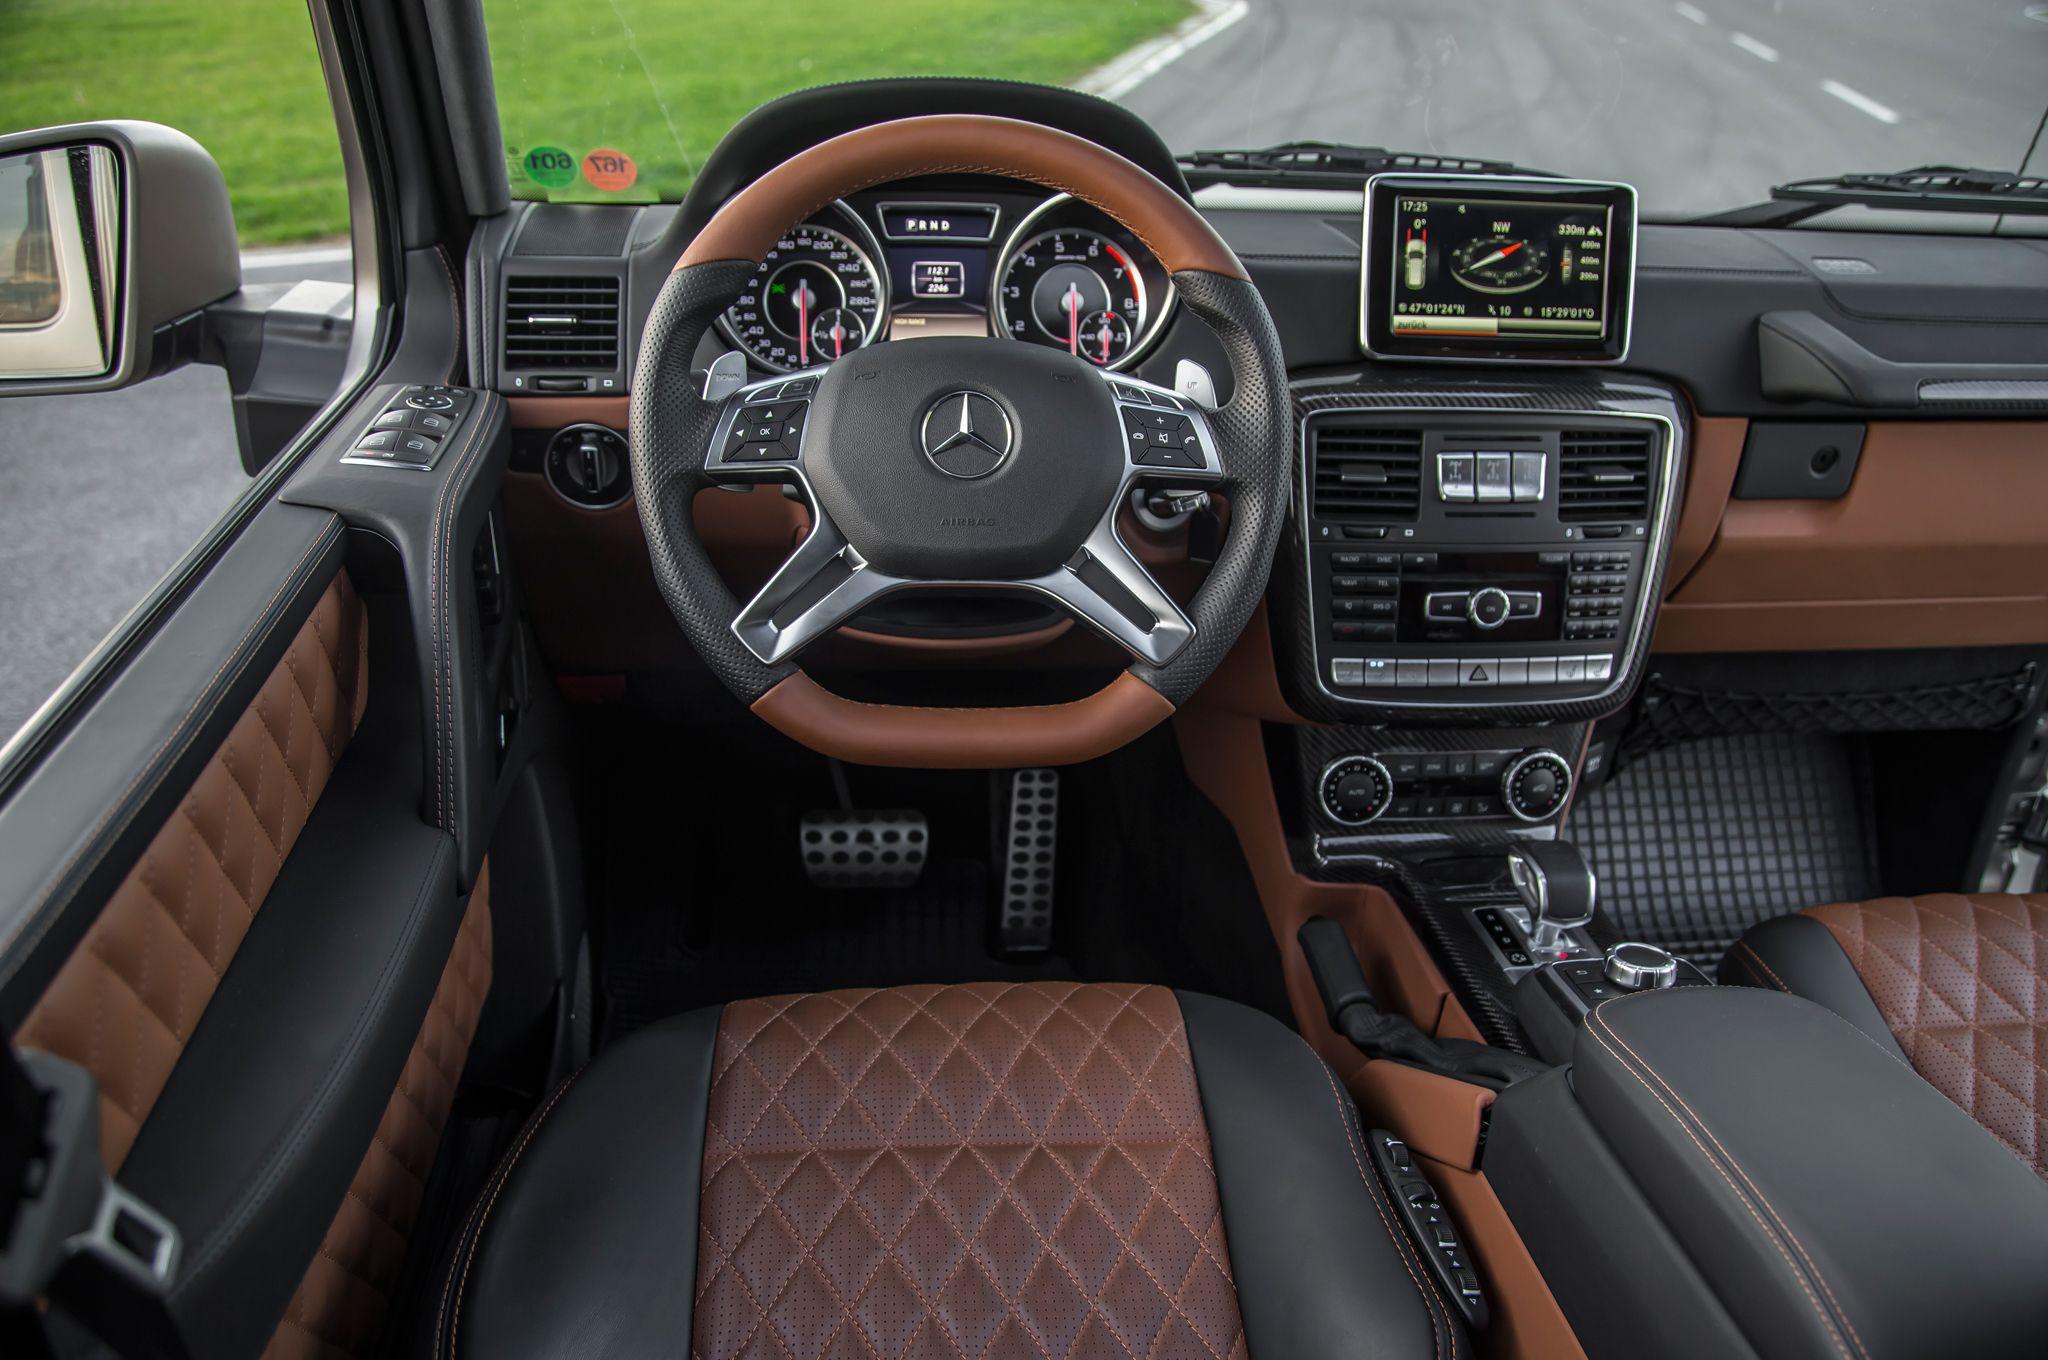 2014 Mercedes Benz G63 Amg 6x6 Mercedes G Wagon Mercedes G Mercedes Benz Suv